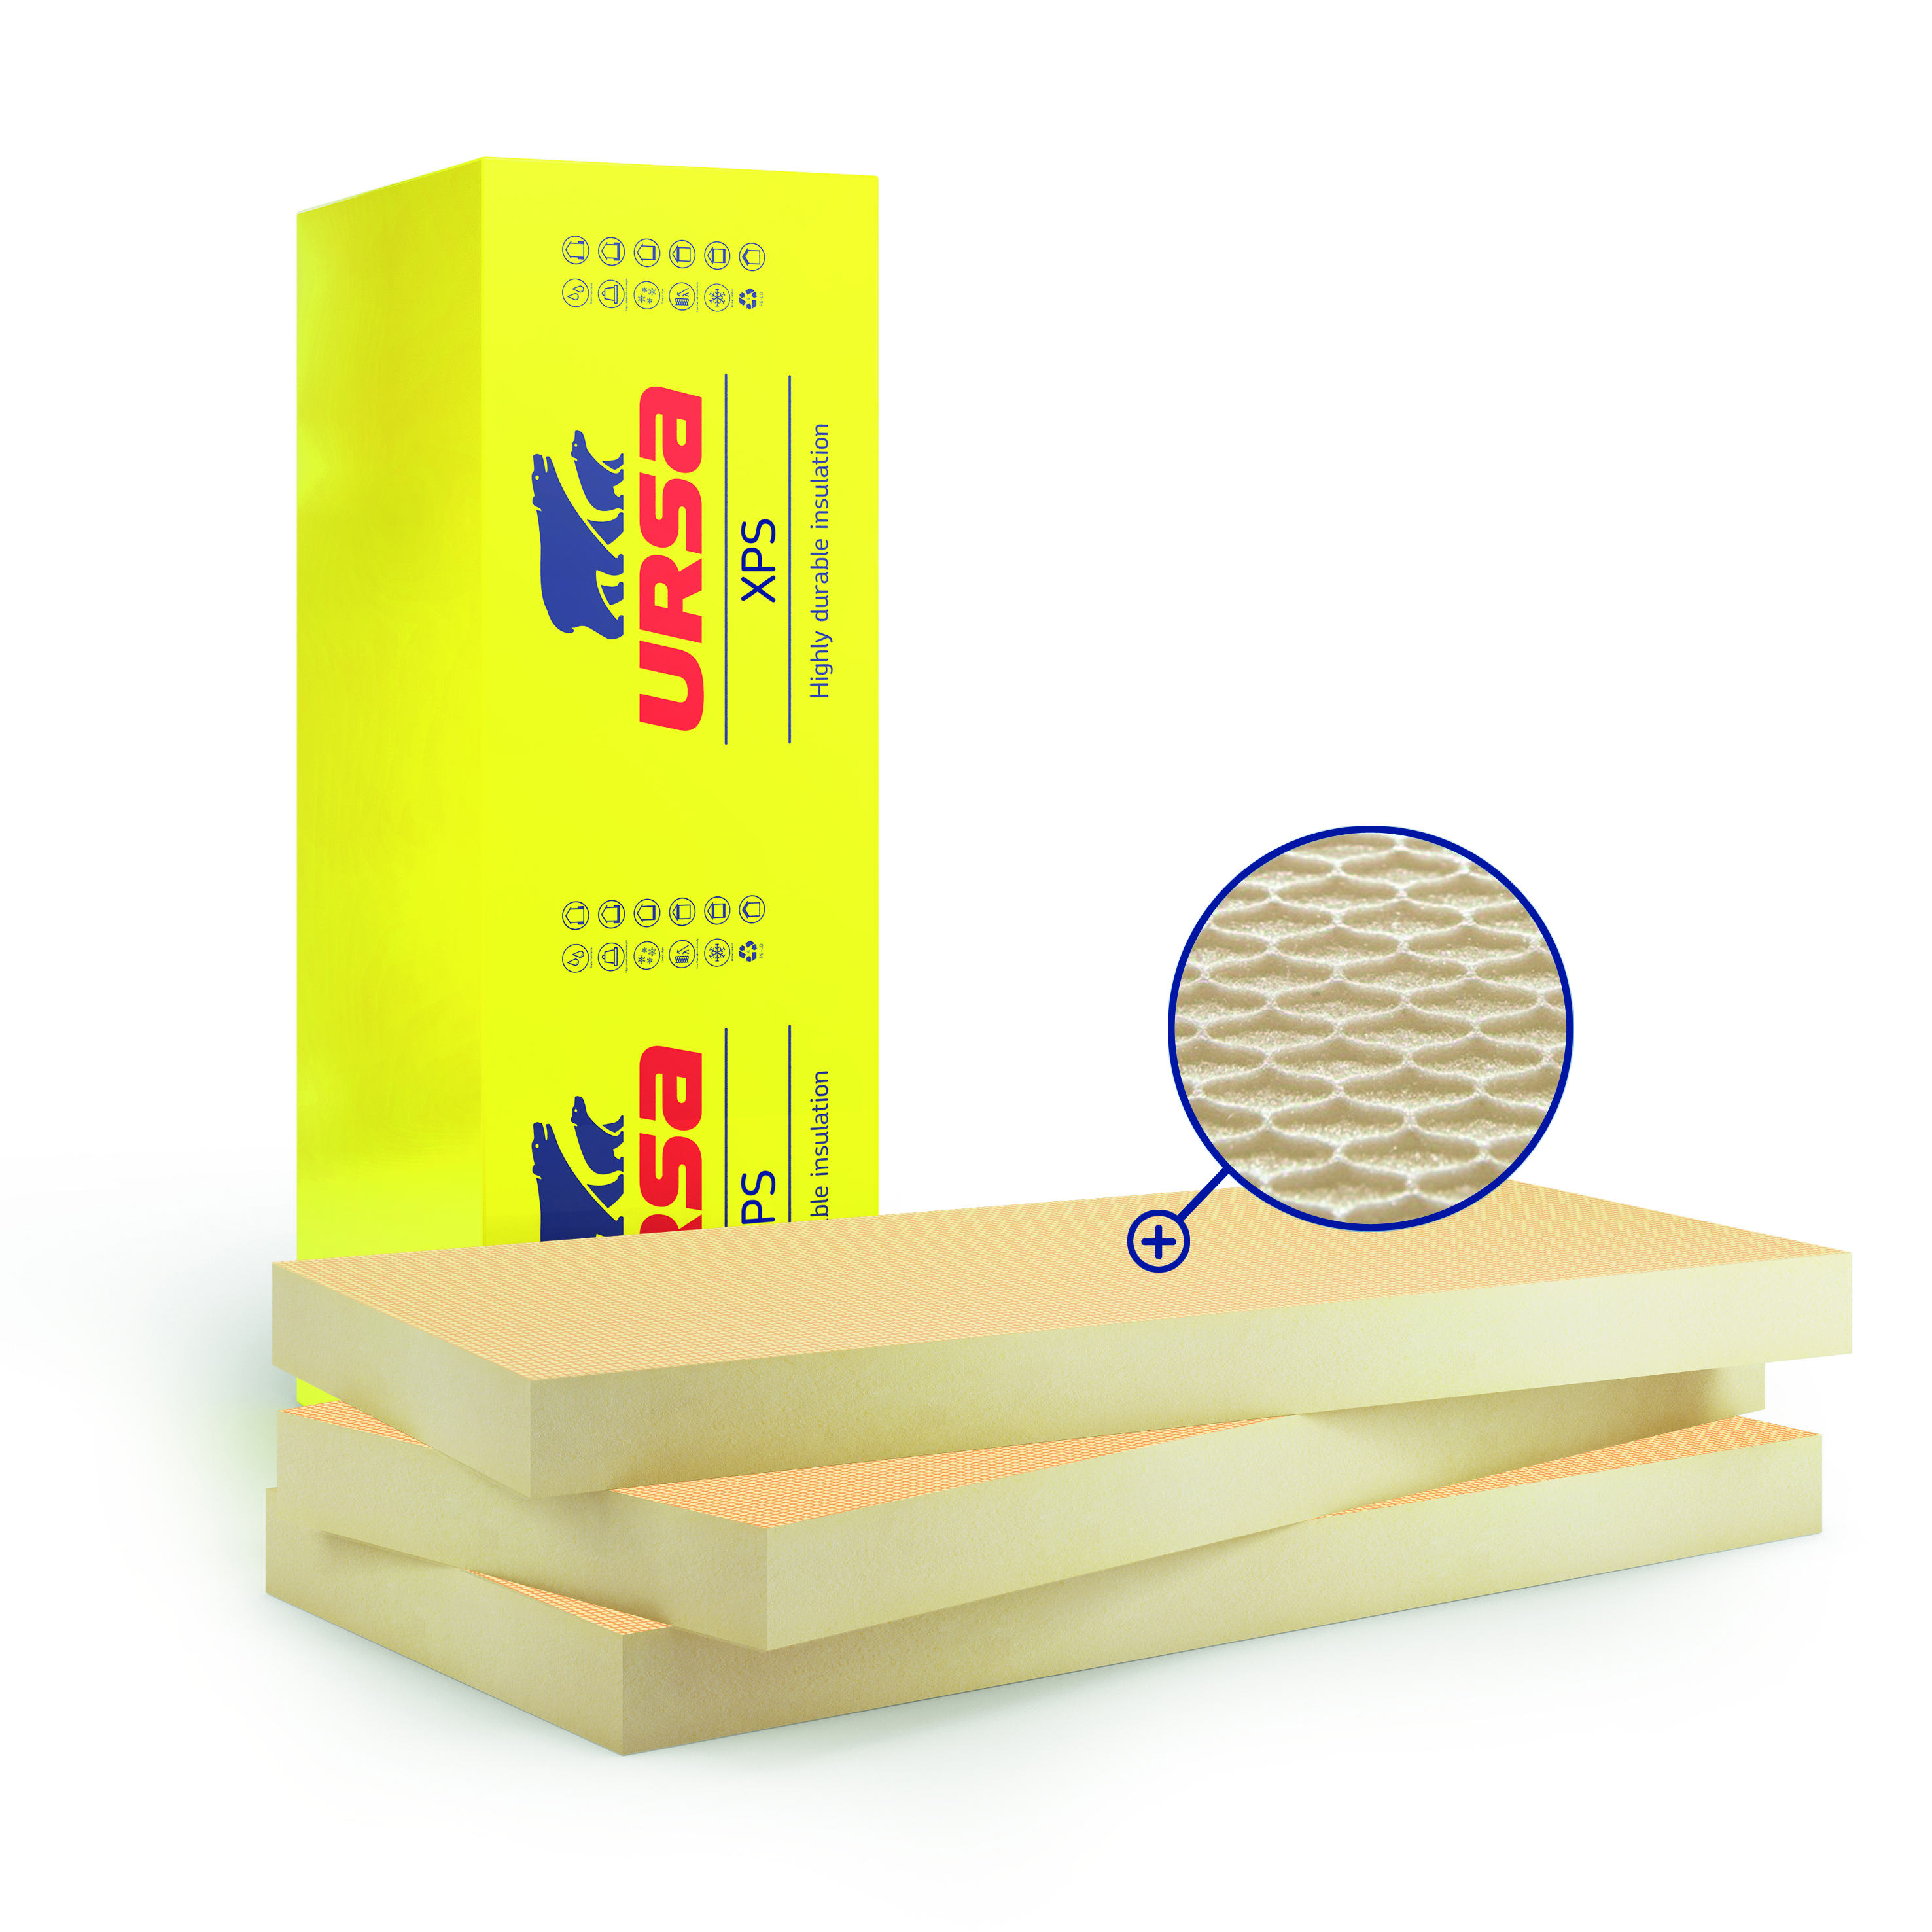 ursa-plus-1520854392.jpg